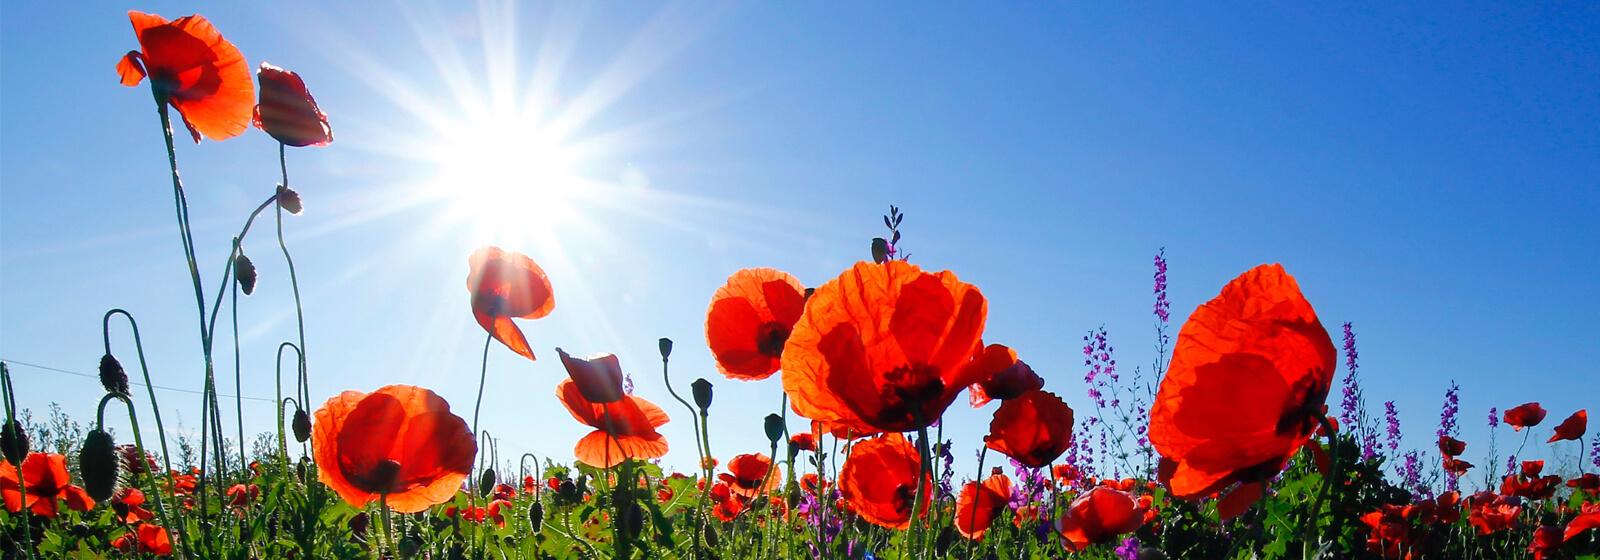 Flower image slide